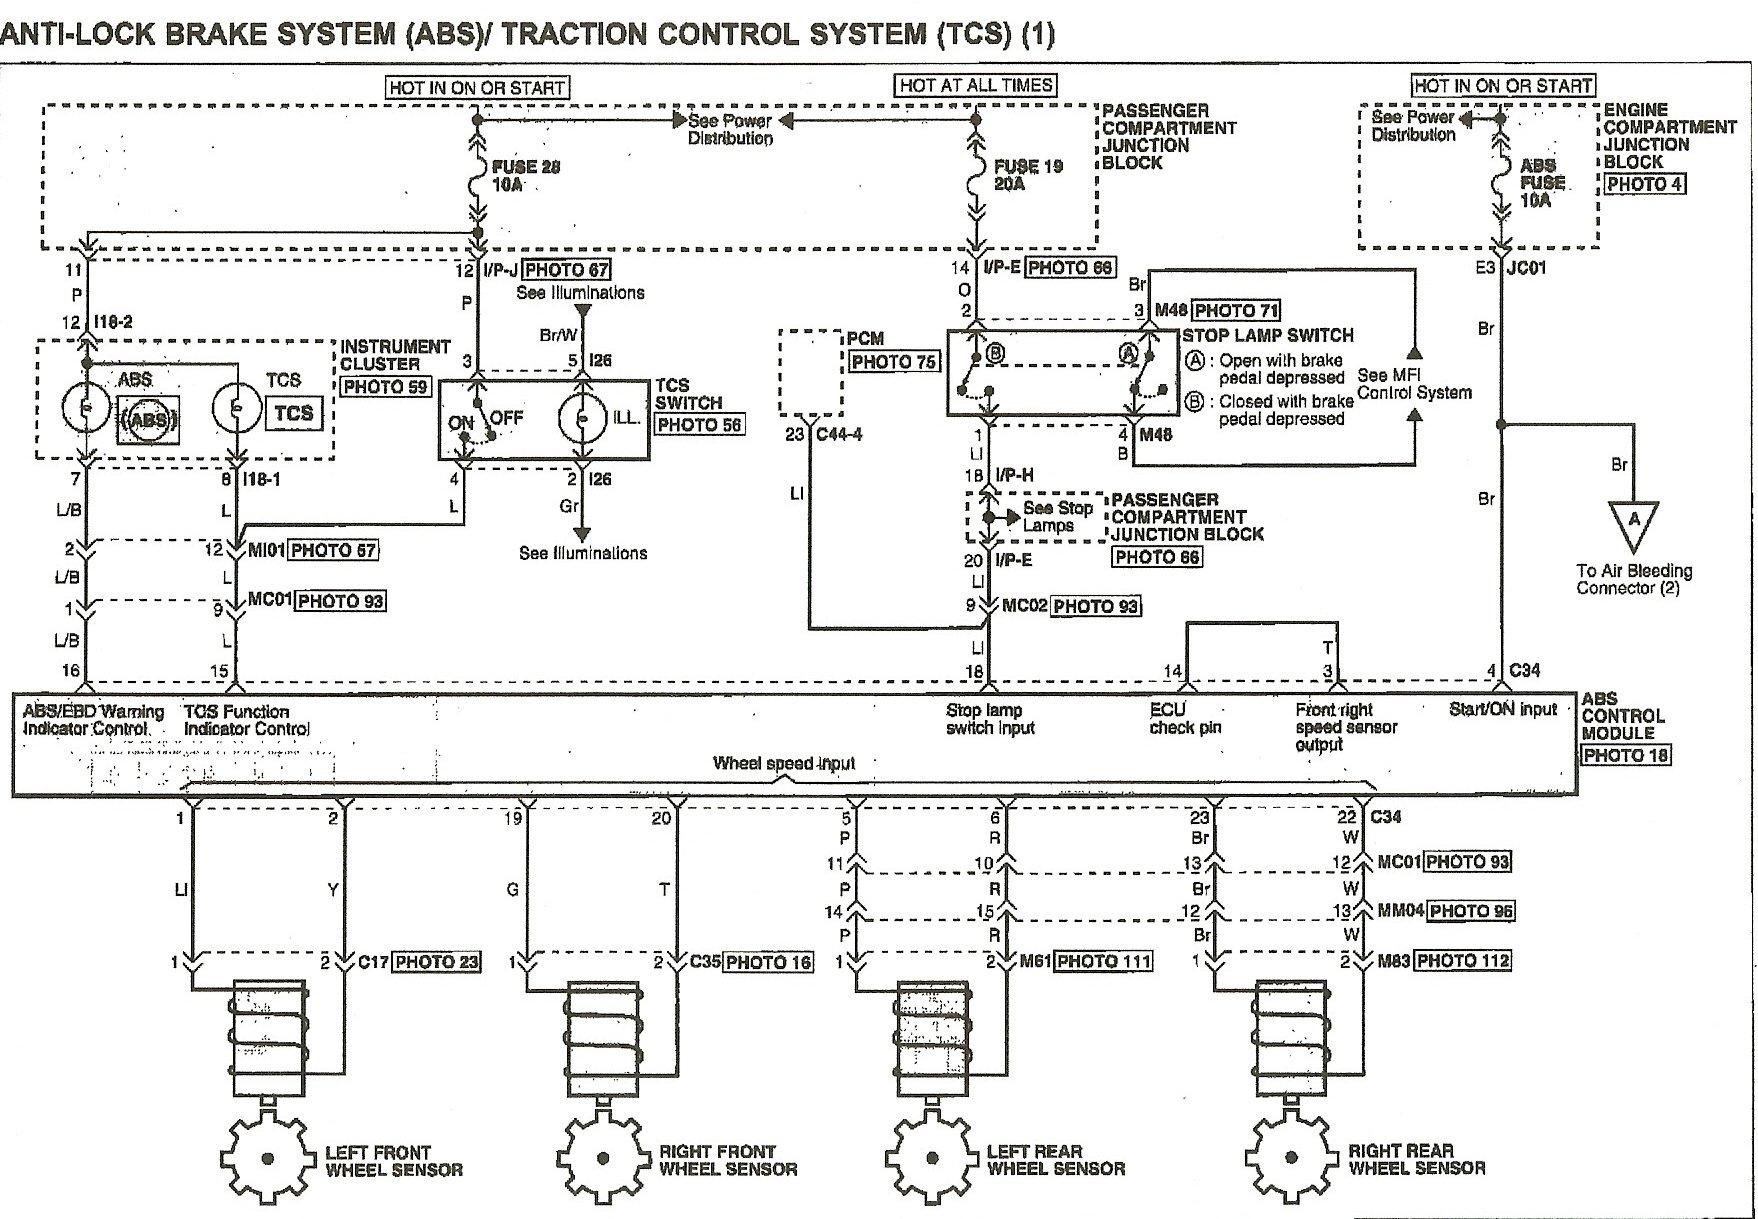 2005 hyundai xg350 wiring diagrams i have a 2005 hyundai xg350 with traction control problems ... #11